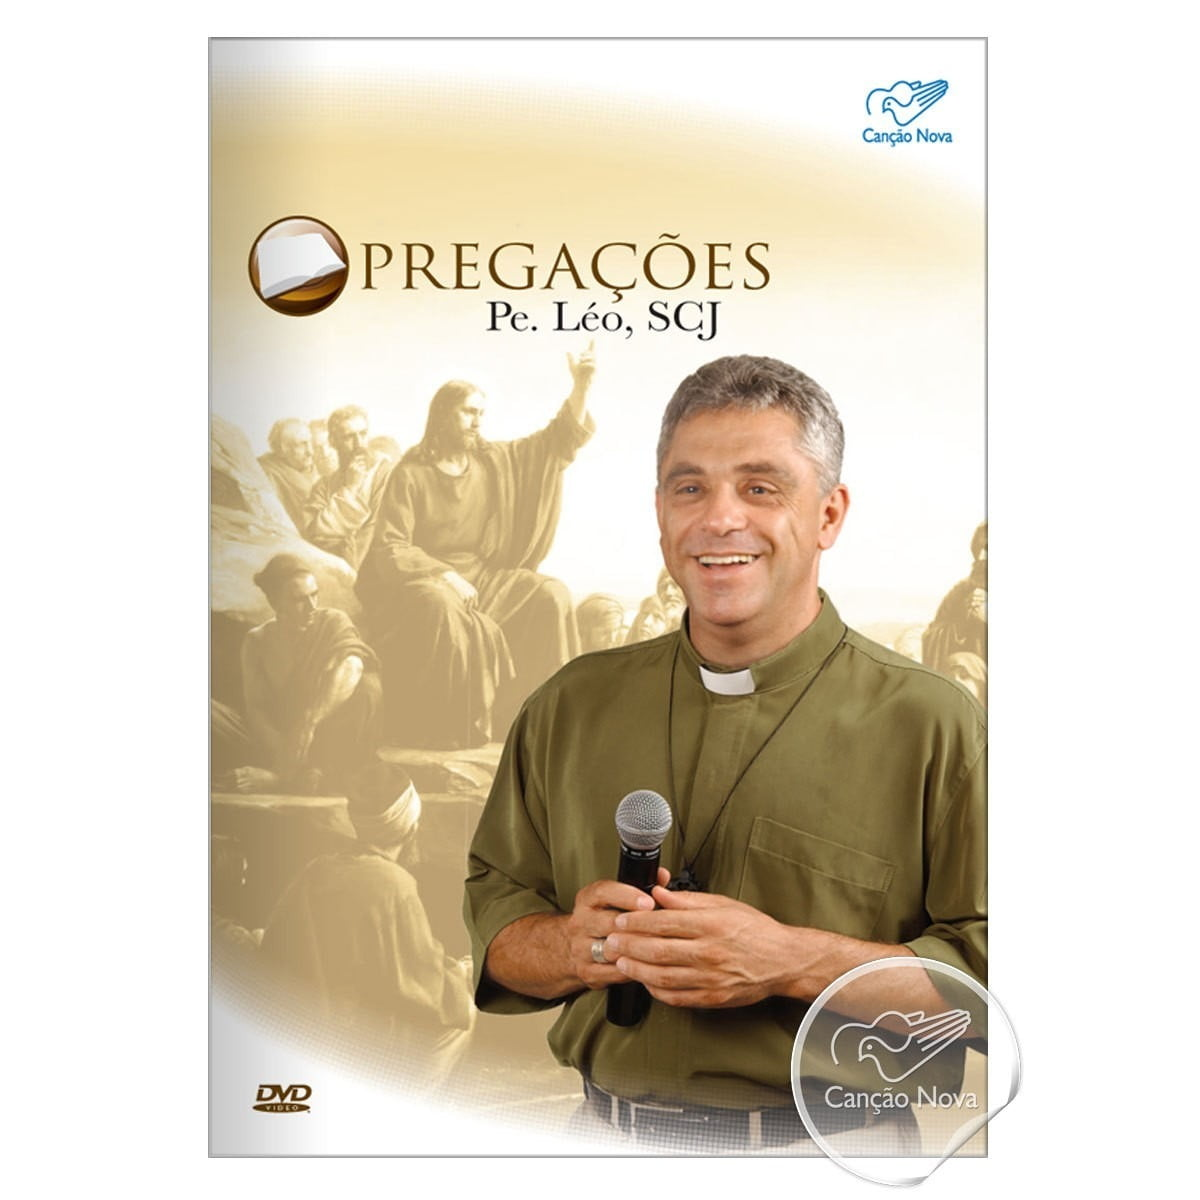 DVD's Palestras e Homilias - Tema Família